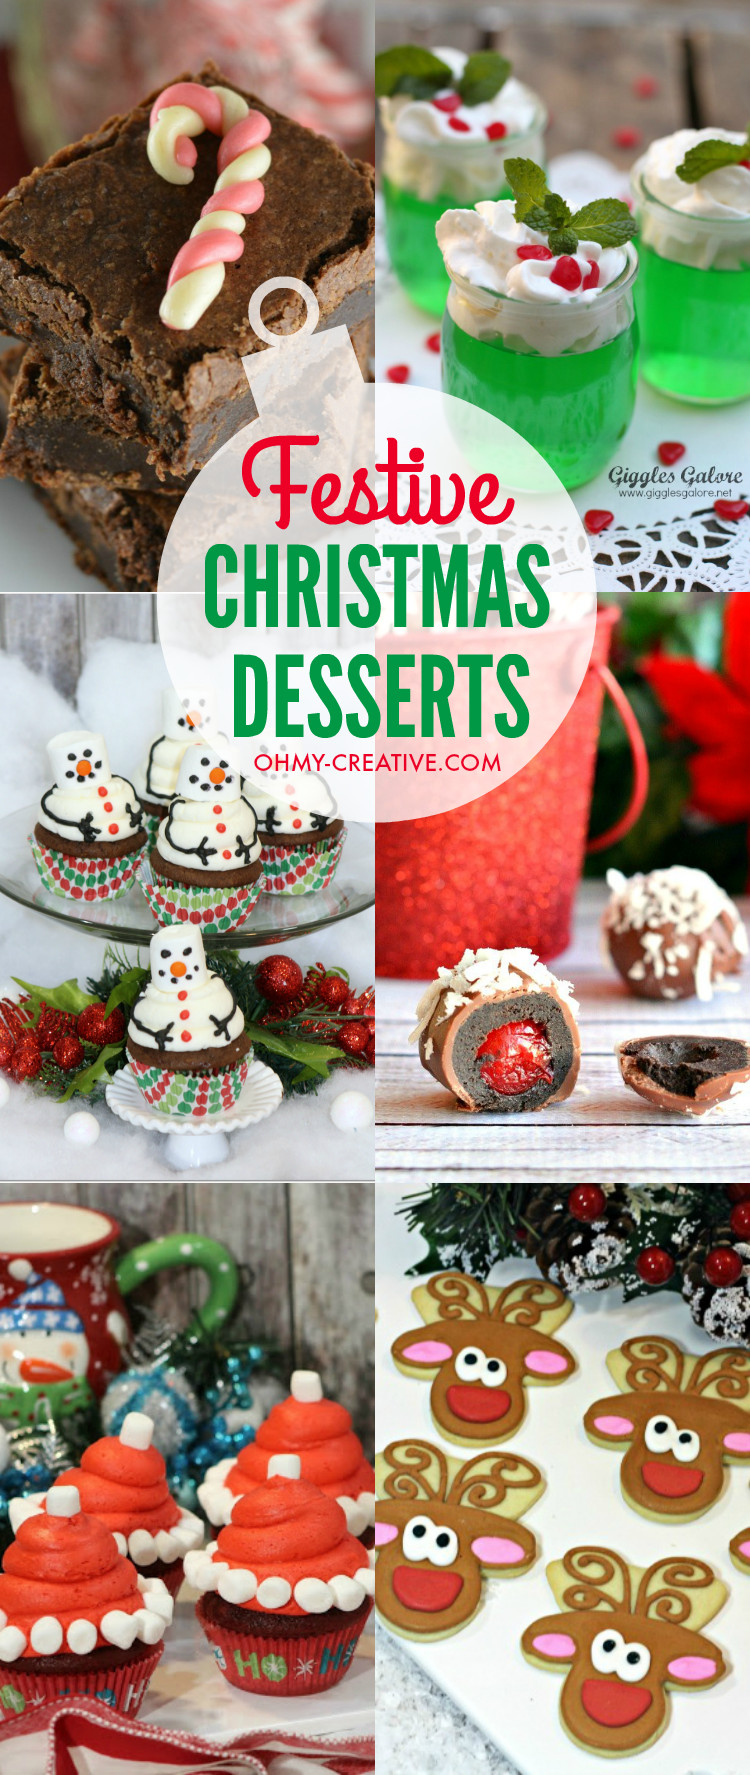 Festive Christmas Desserts  Festive Christmas Desserts Oh My Creative